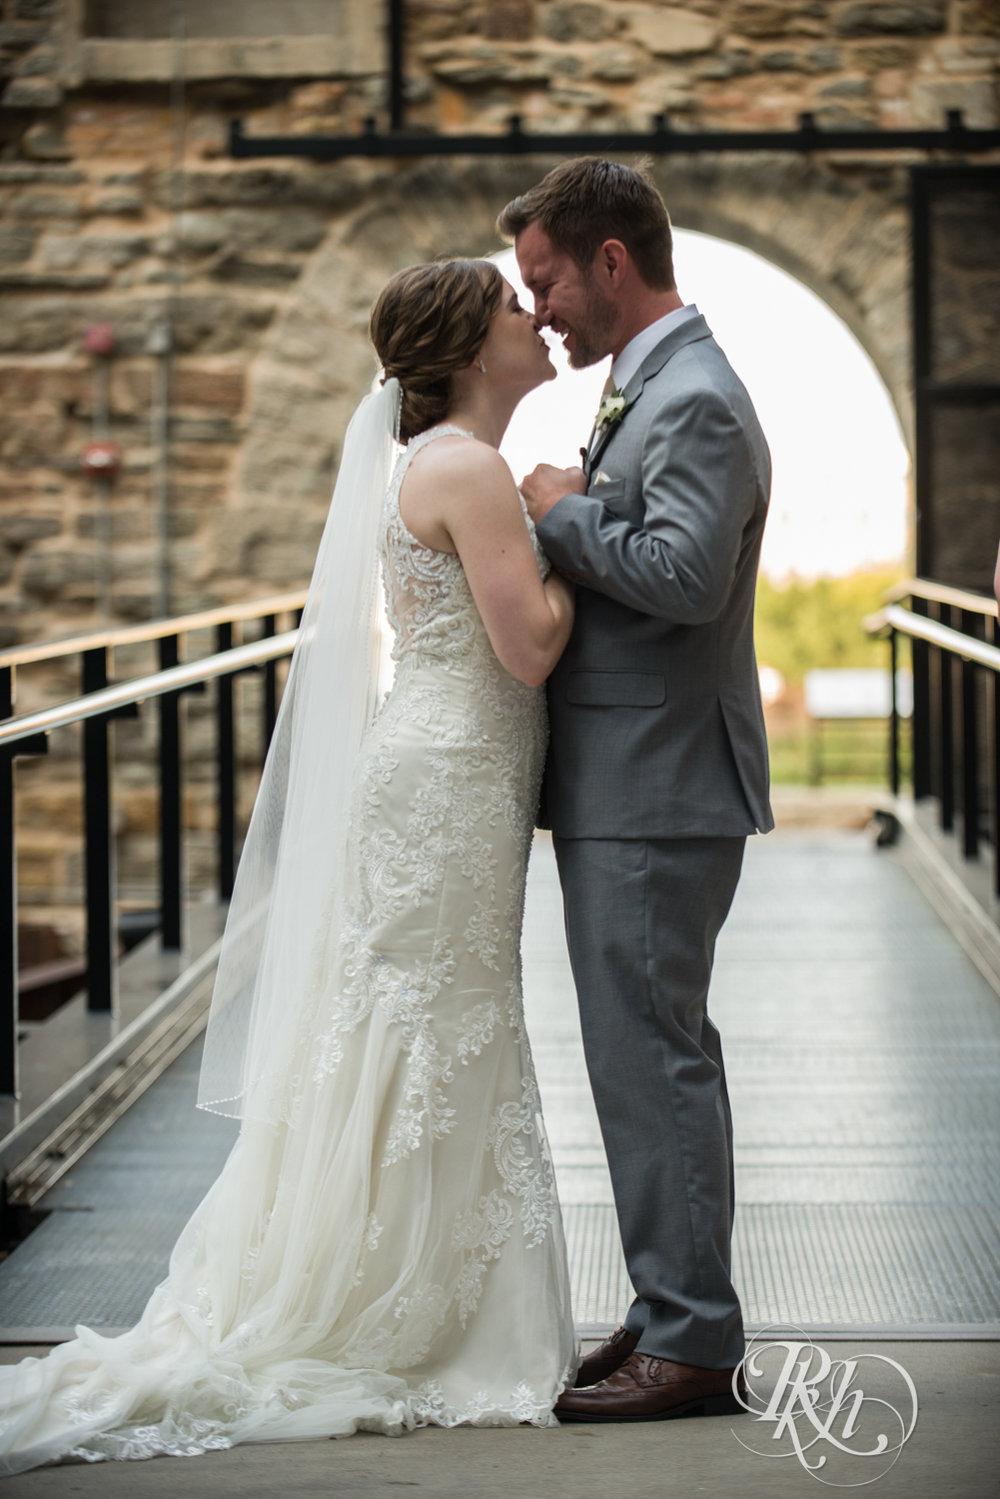 Lauren & Matt - Minnesota Wedding Photography - Mill City Museum - RKH Images - Blog (31 of 55).jpg